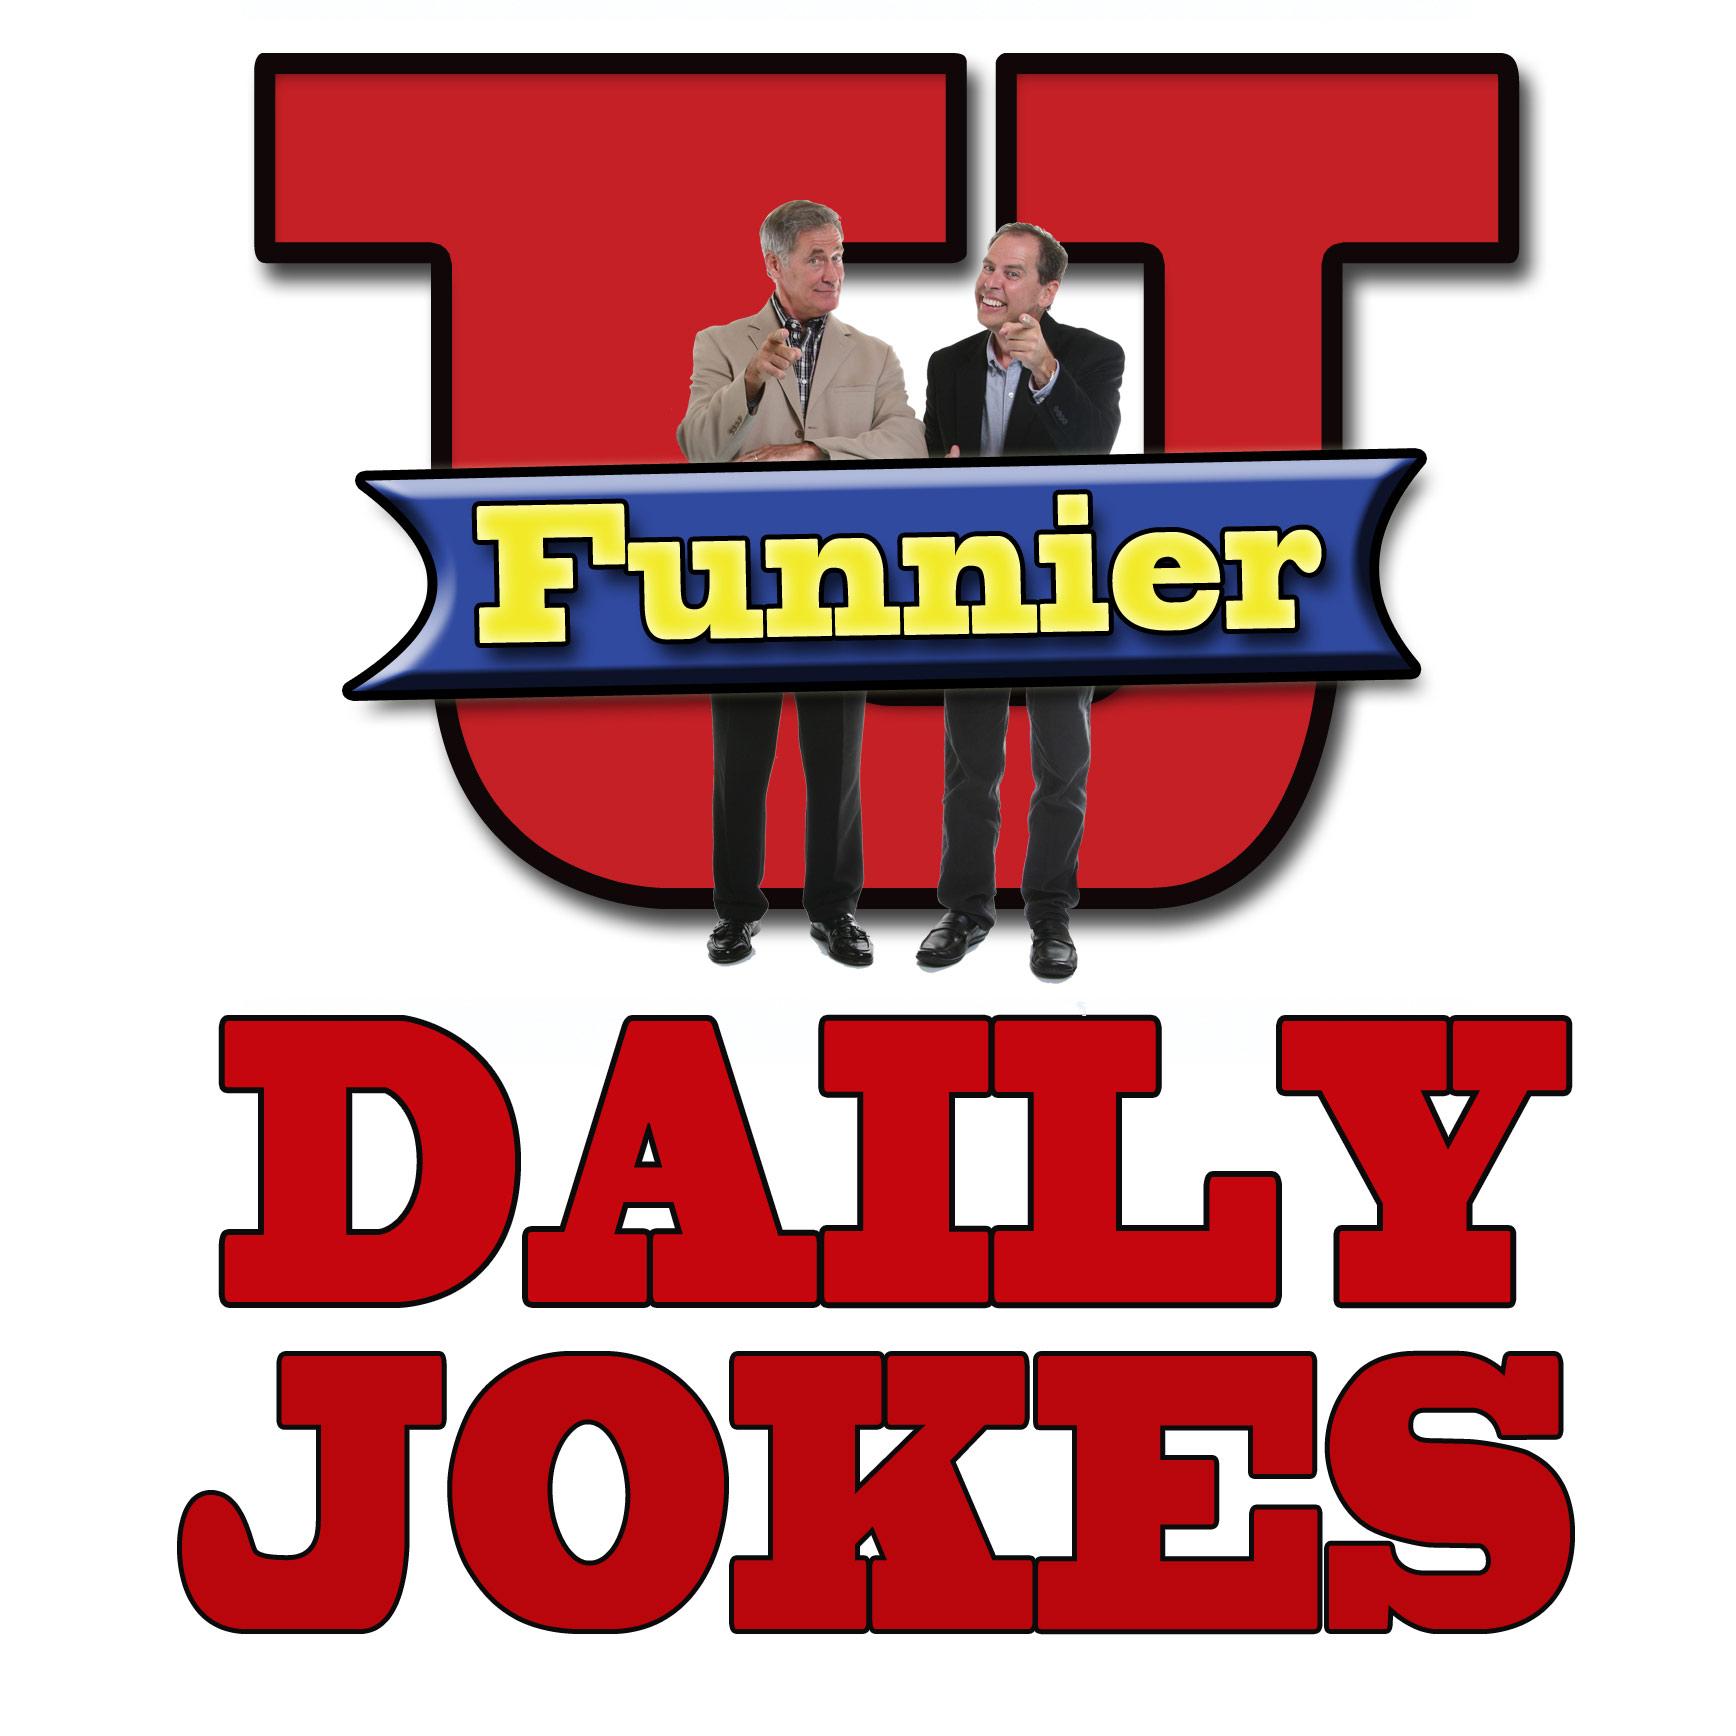 daily-jokes-book